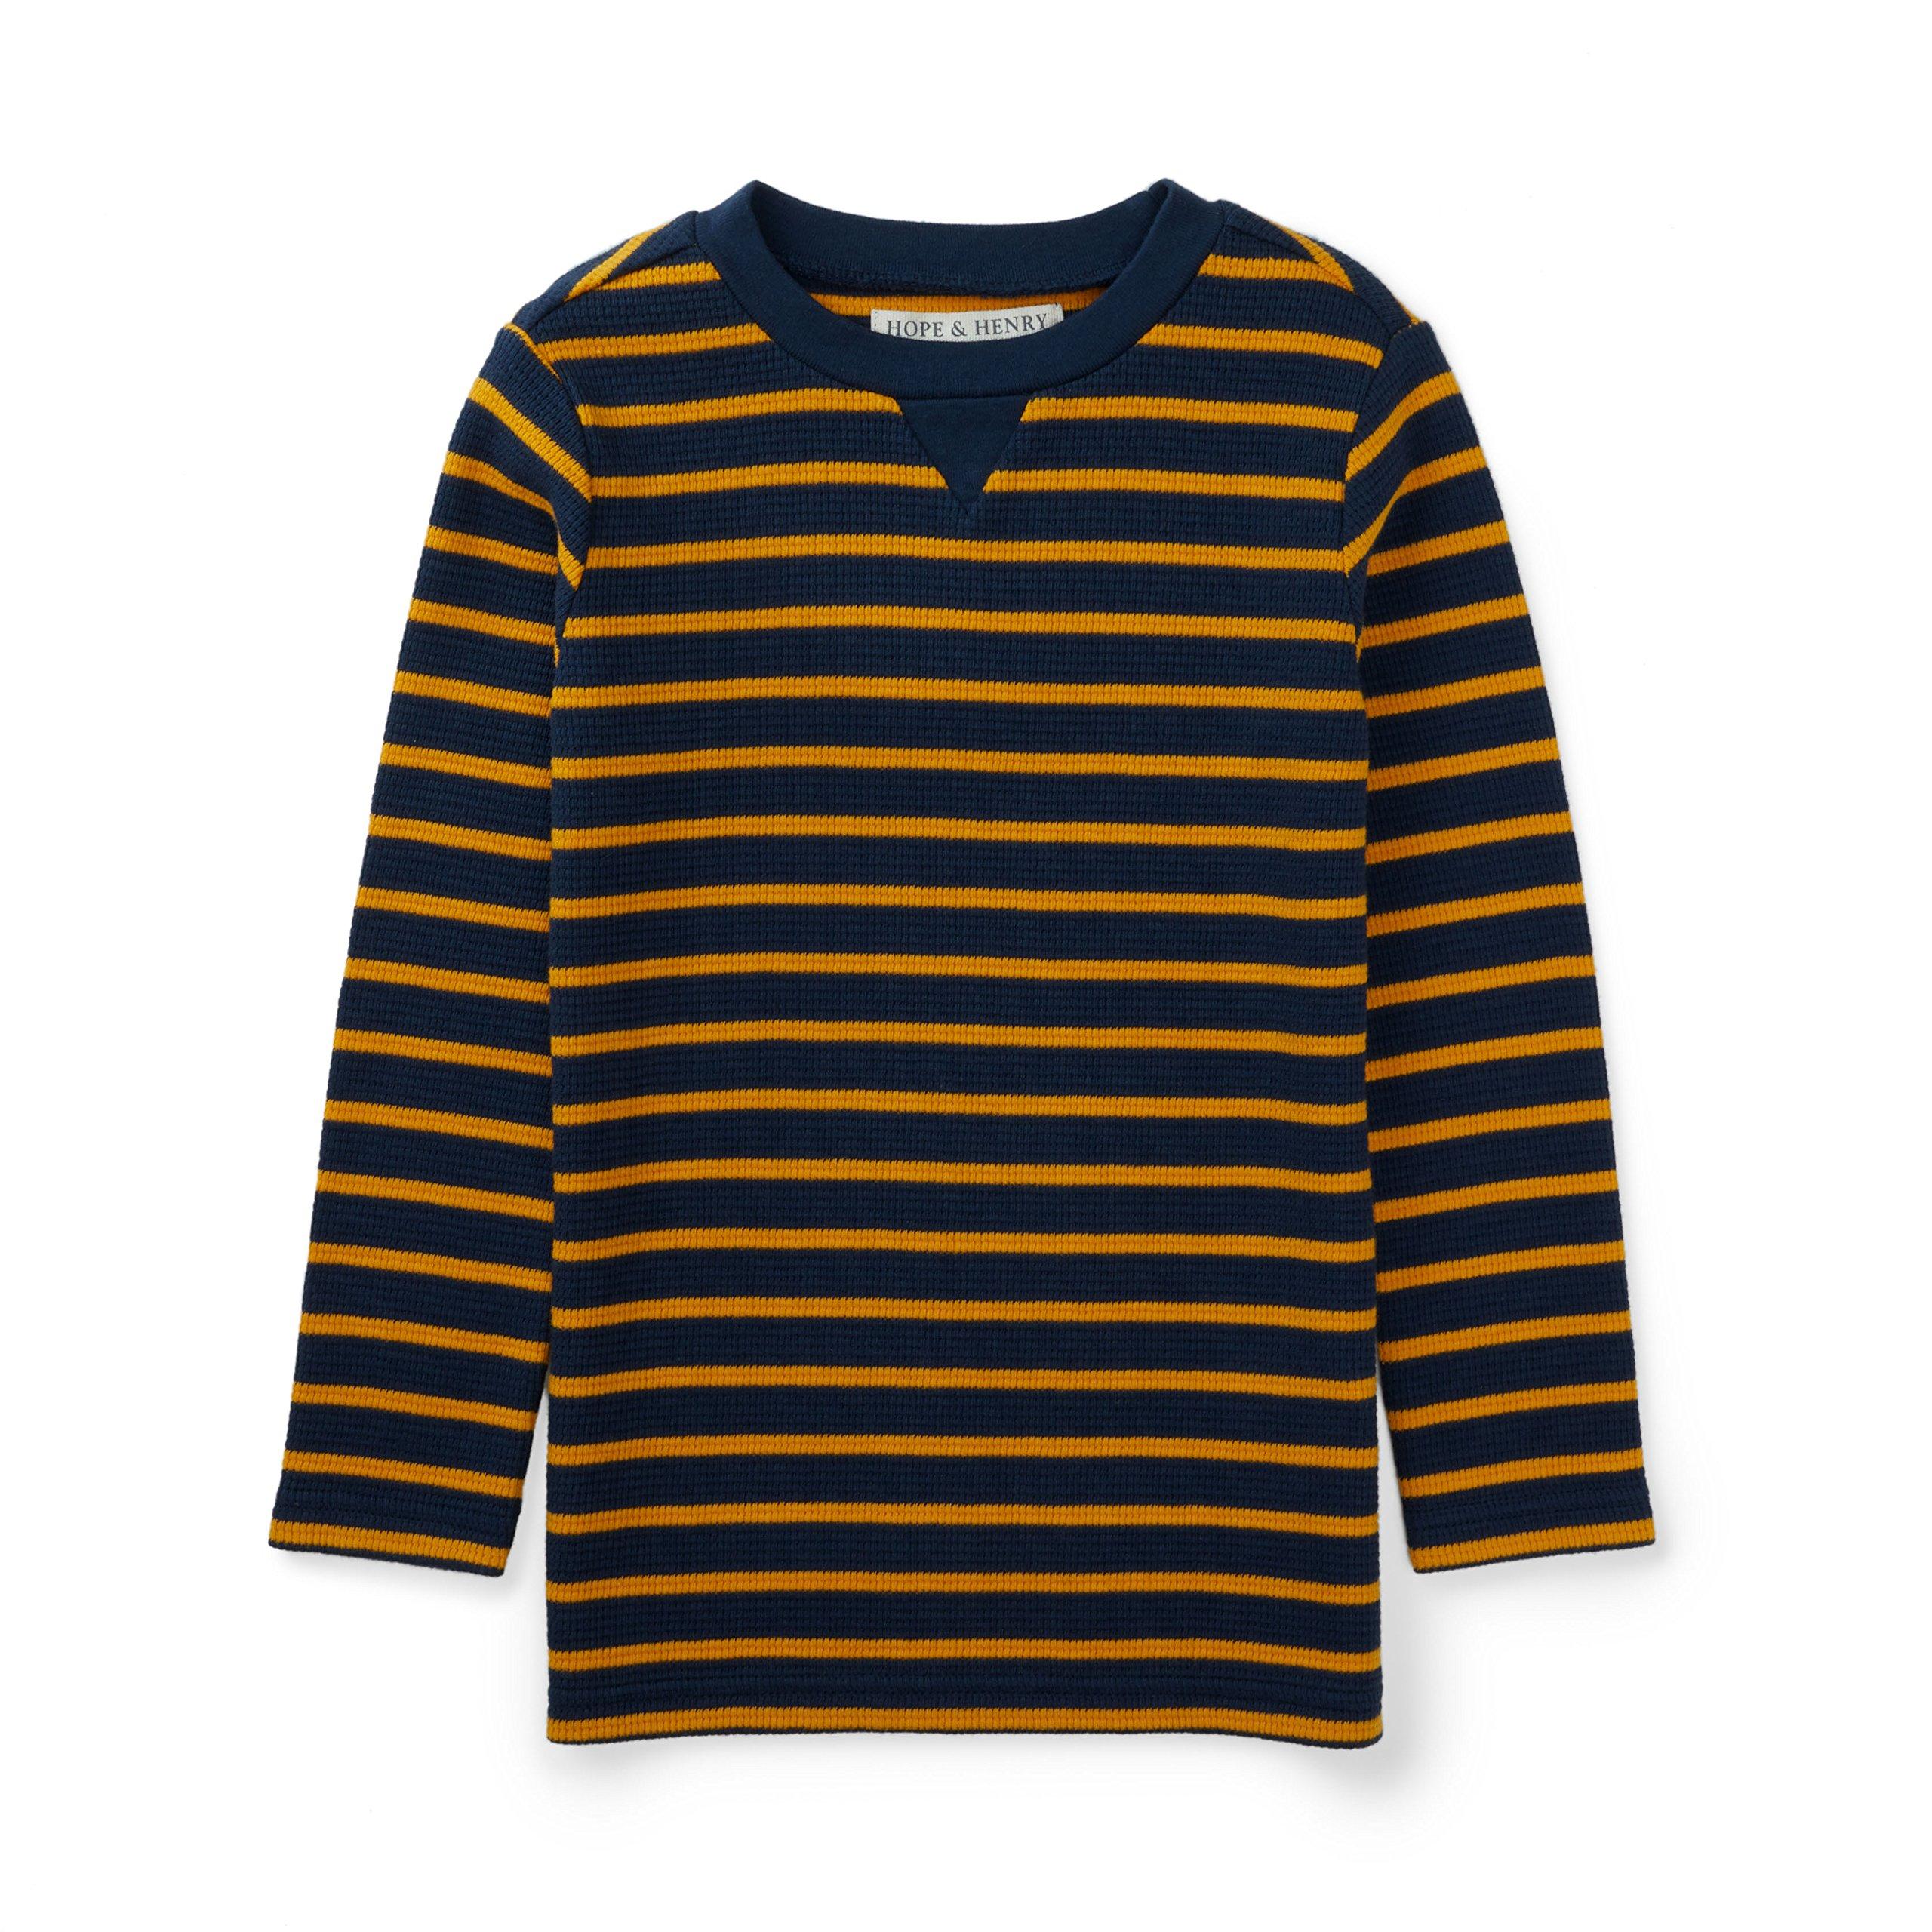 Hope /& Henry Boys Long Sleeve Rugby Polo Shirt